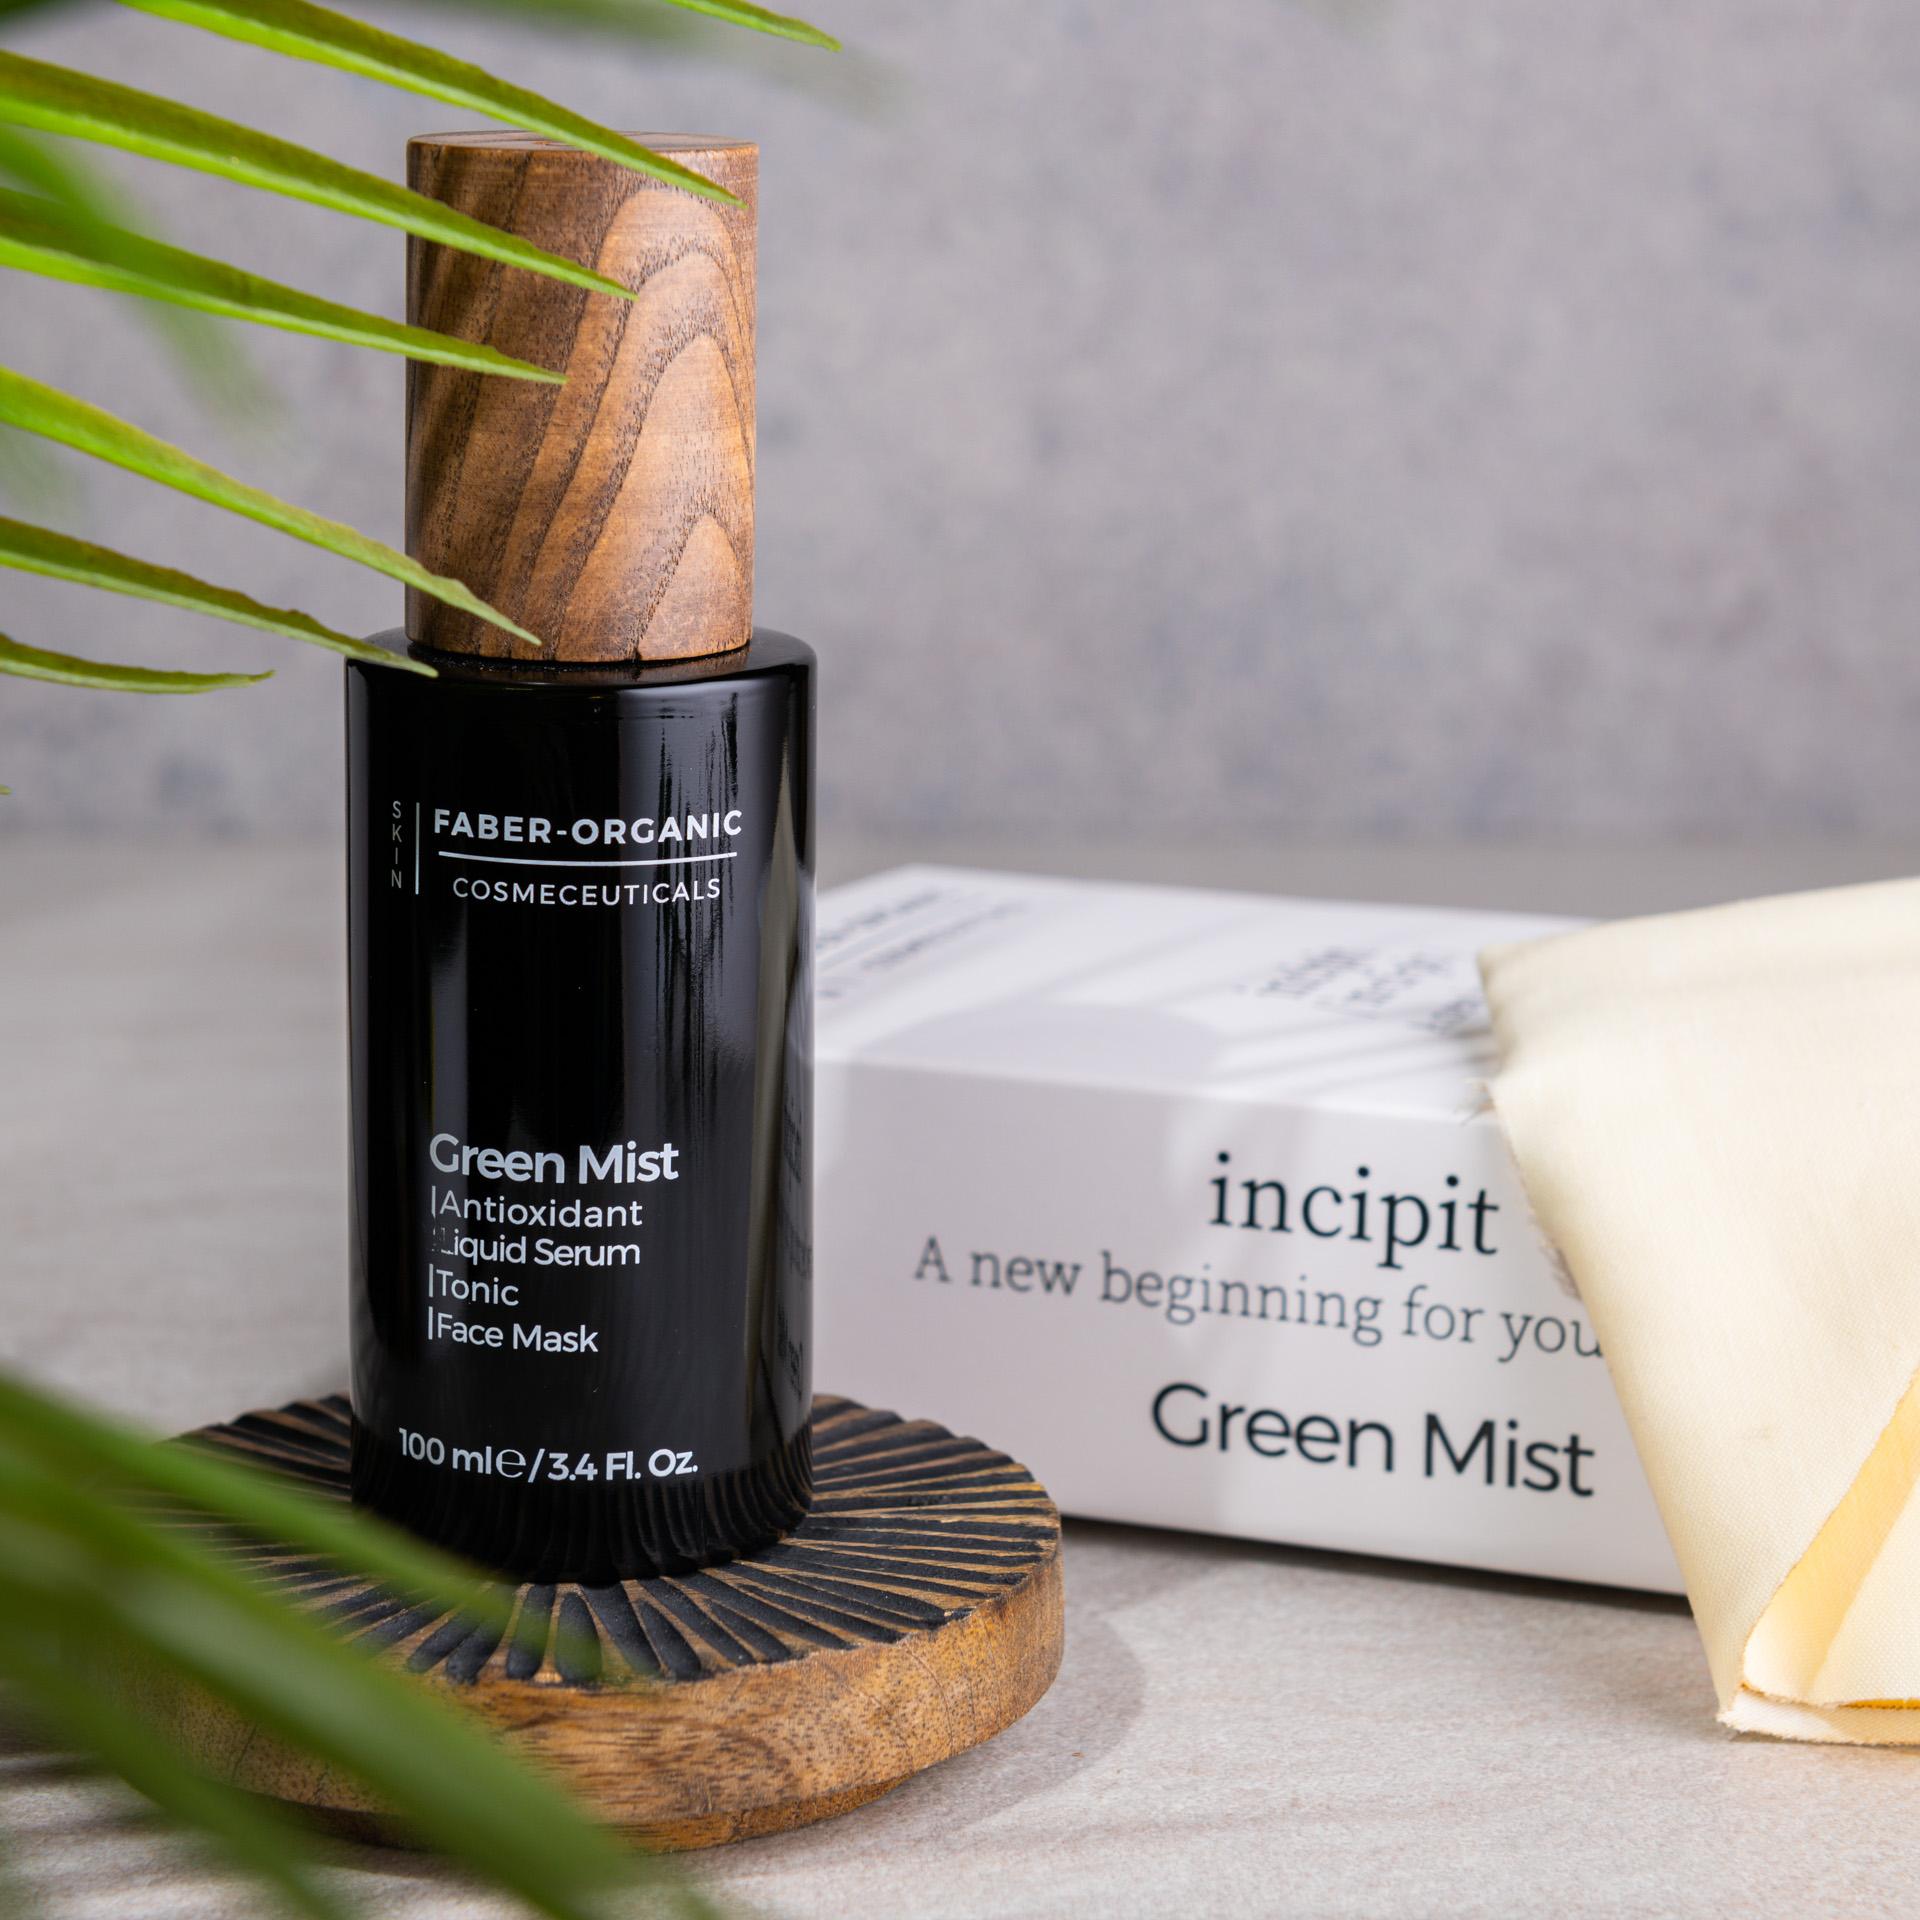 Green Mist - Antioxidant Liquid Serum - Tonic - Face Mask